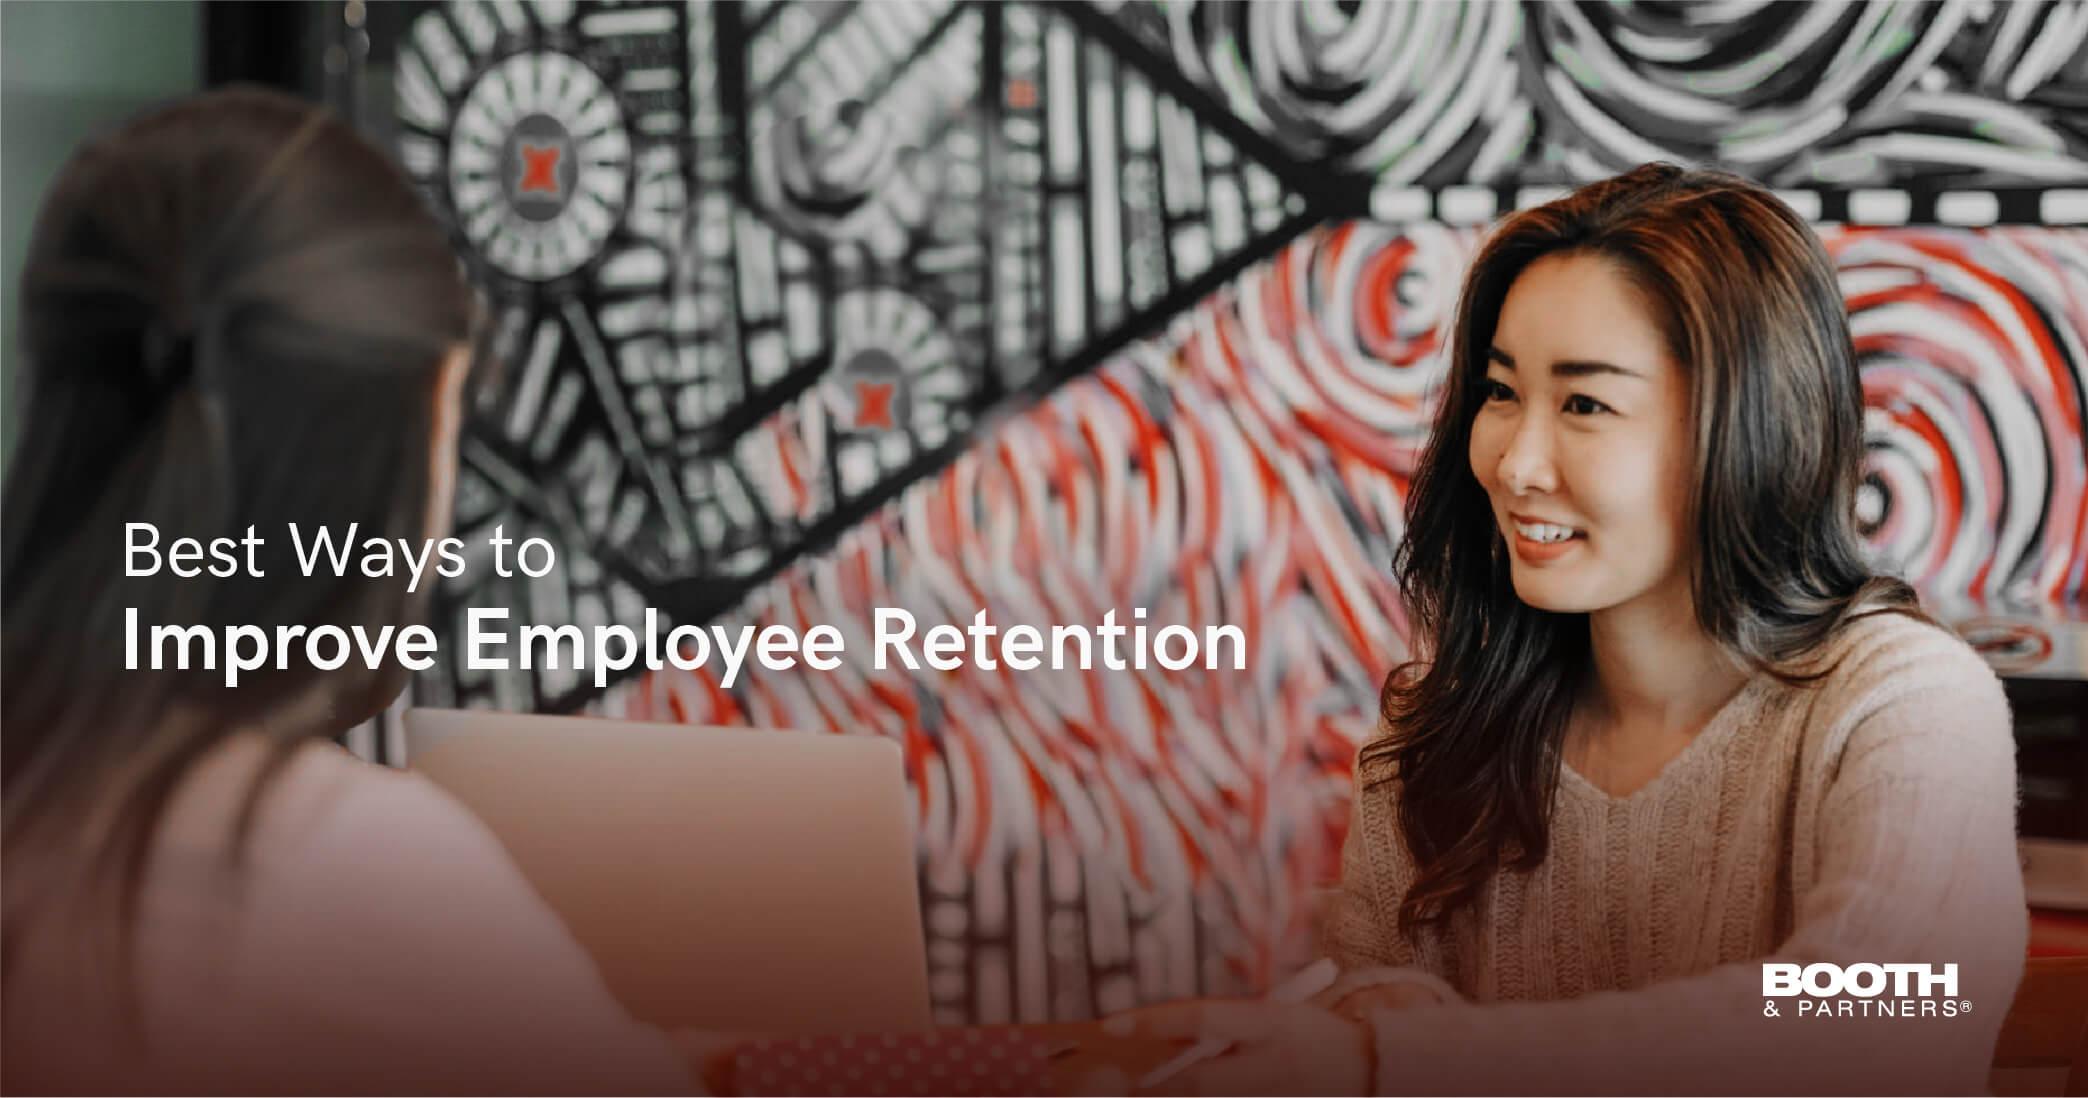 Best Ways to Improve Employee Retention